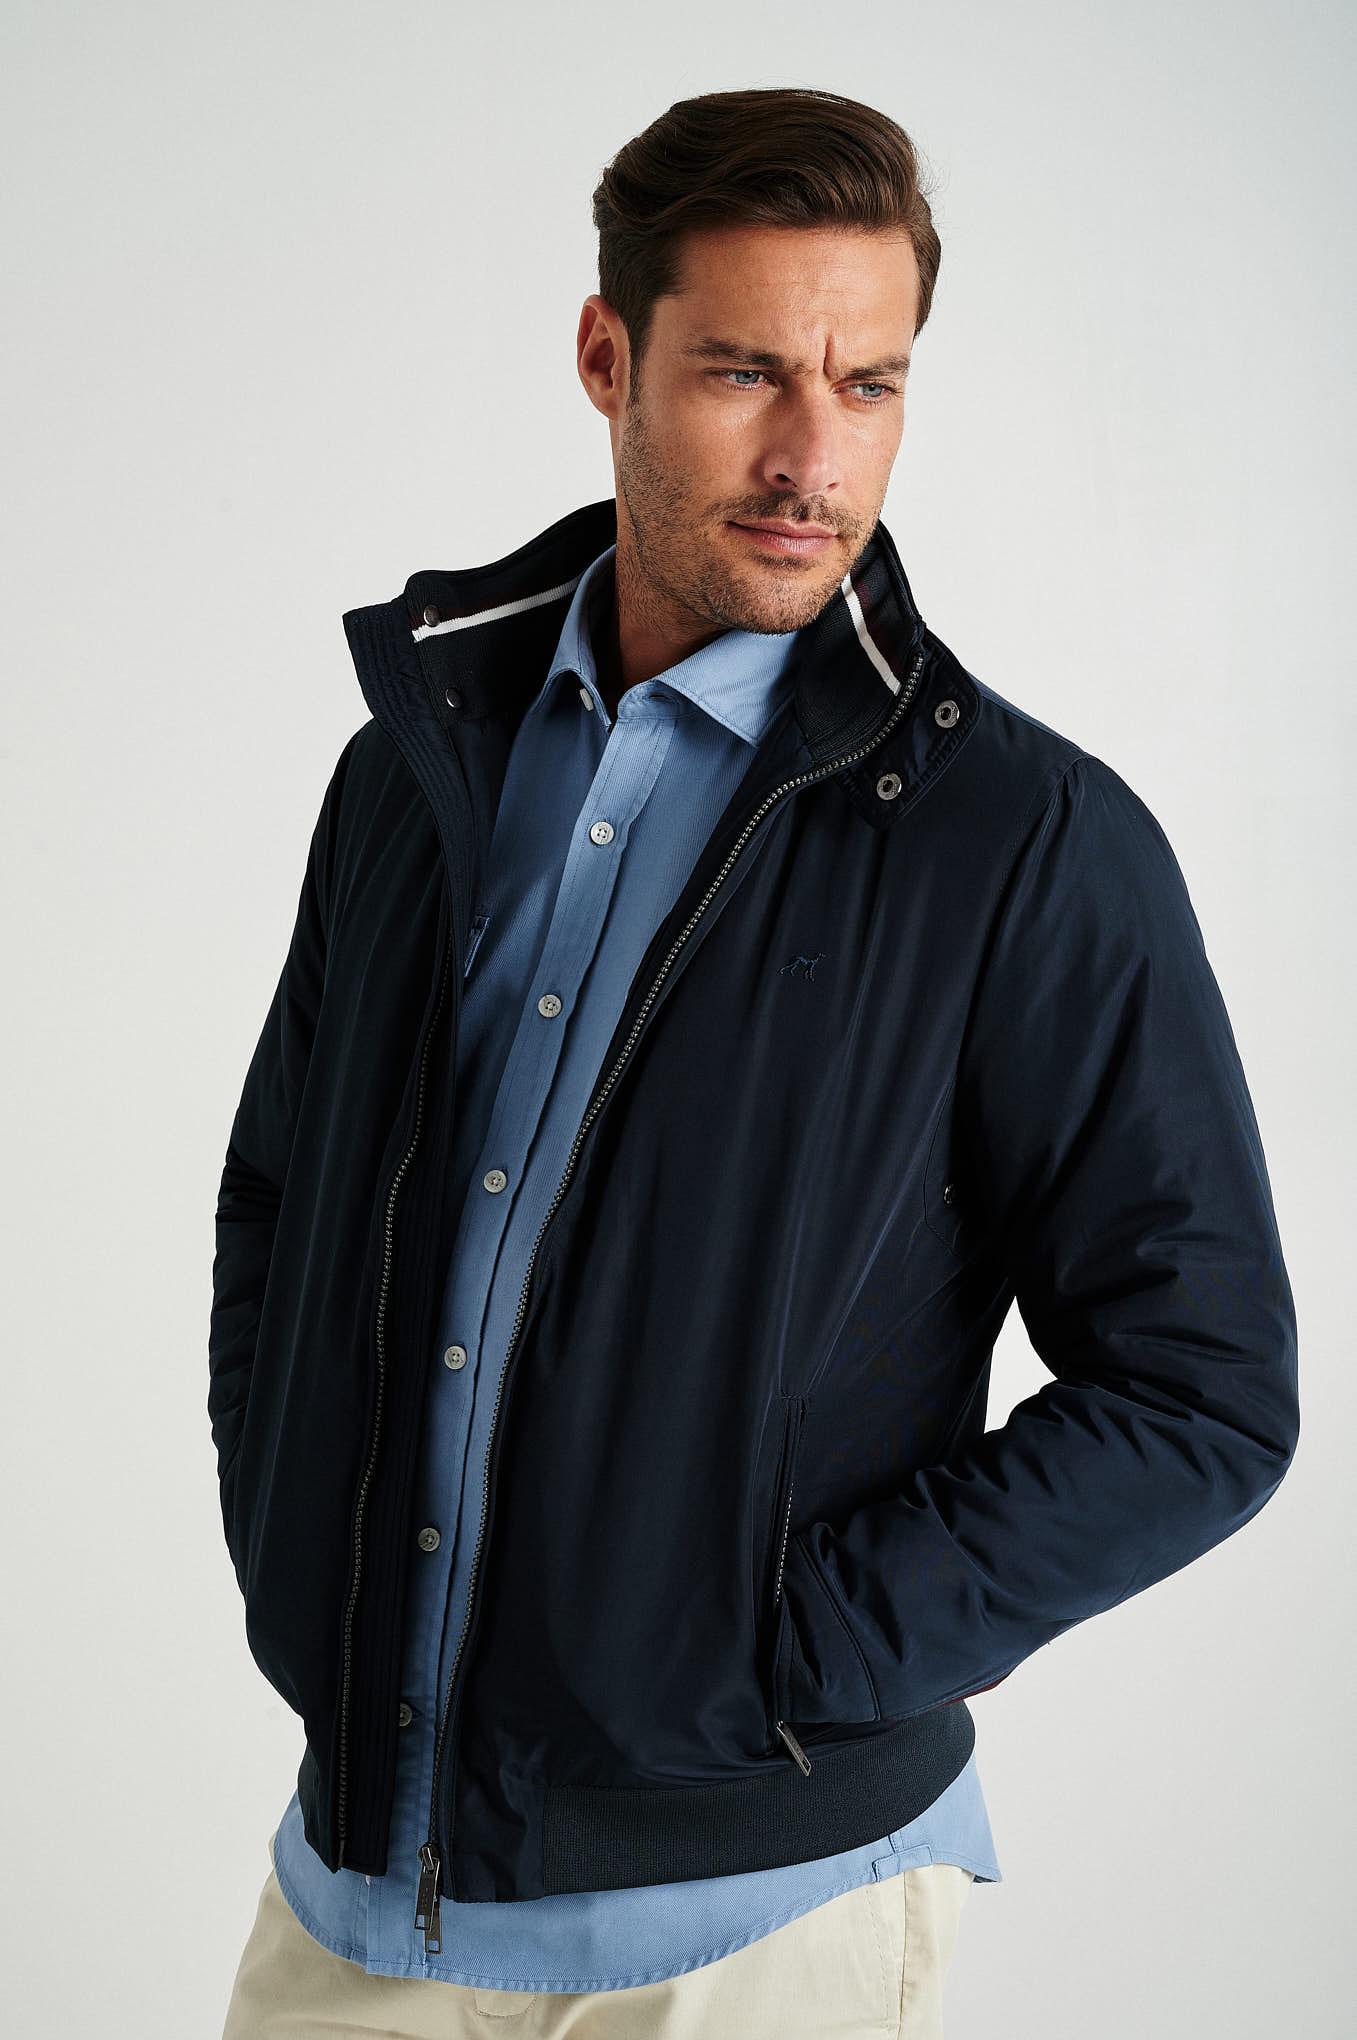 Jacket Dark Blue Casual Man